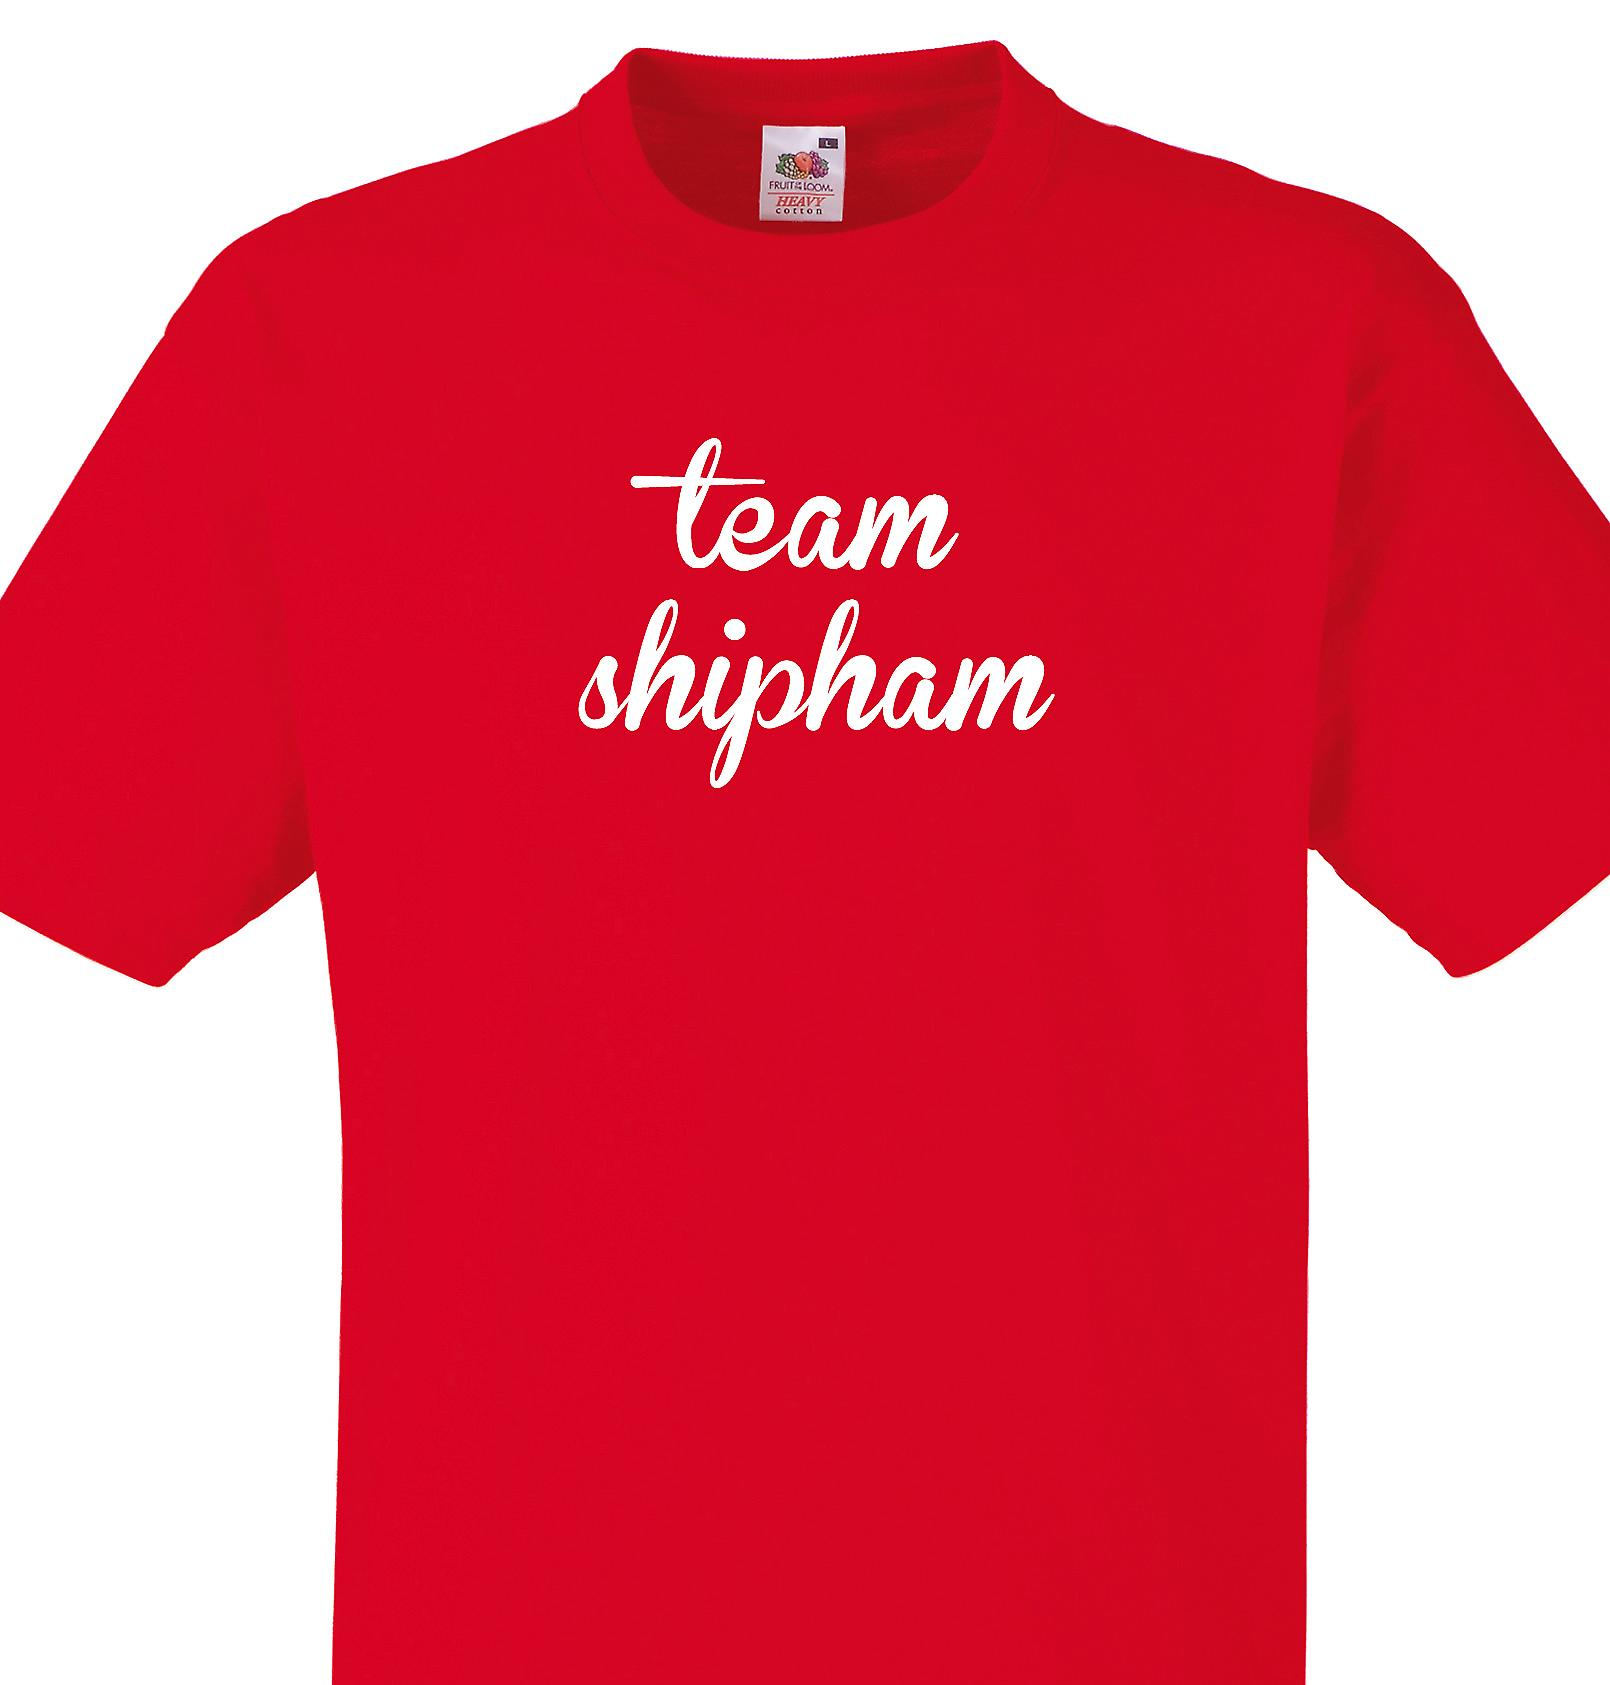 Team Shipham Red T shirt